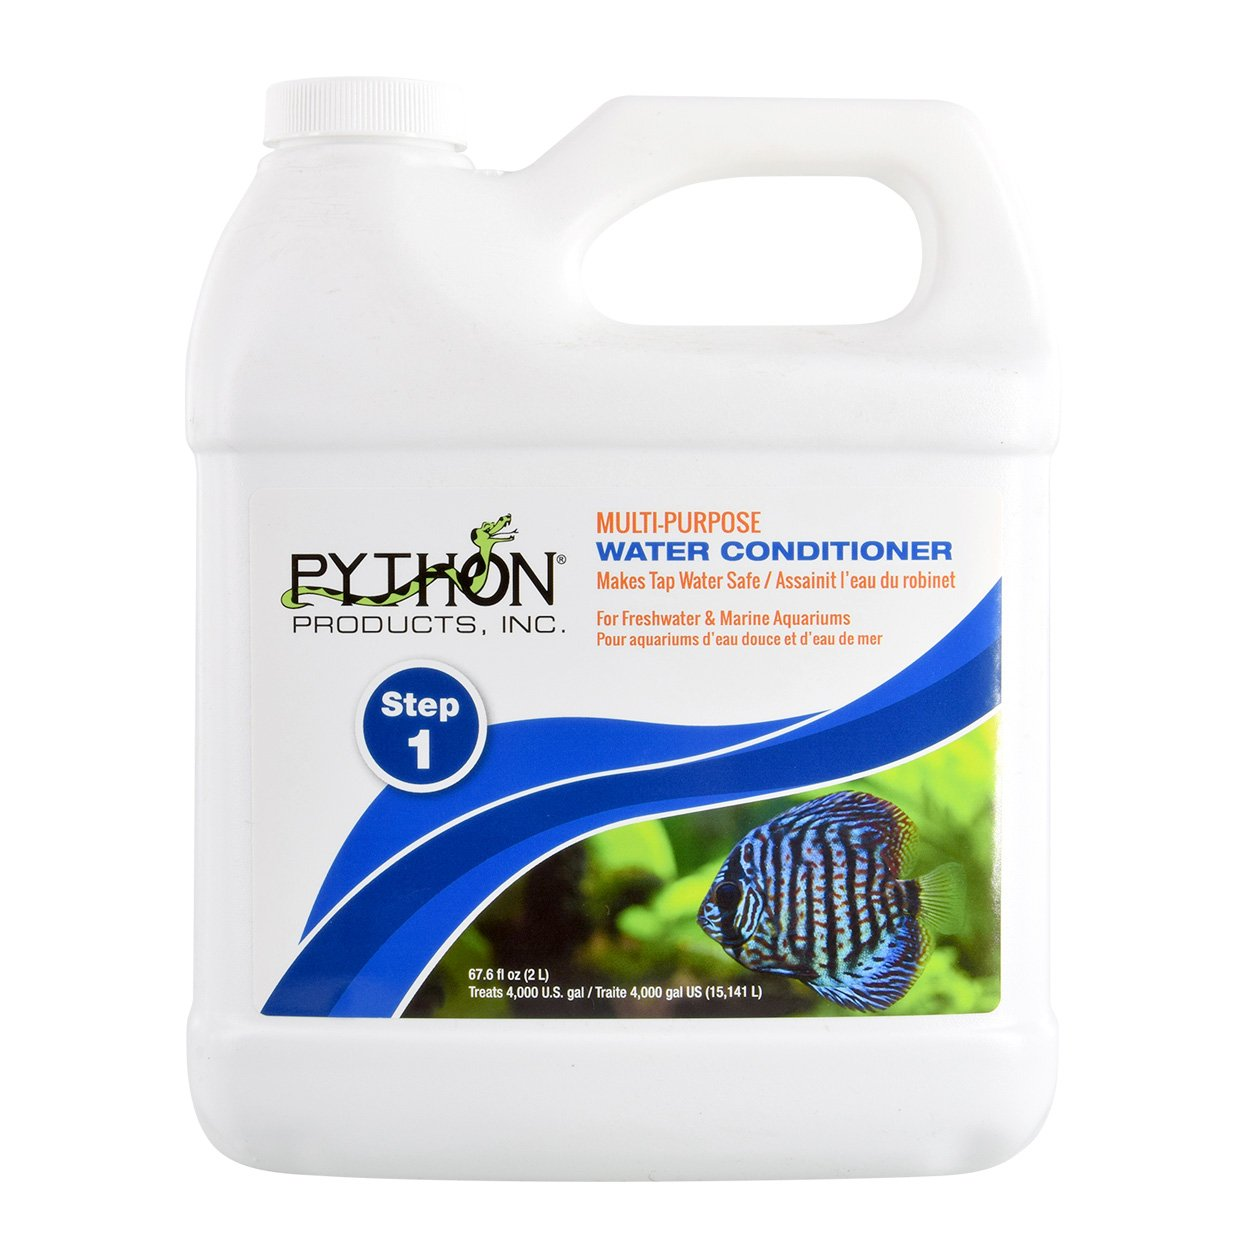 Python Multi-Purpose Water Conditioner, 67.6 oz